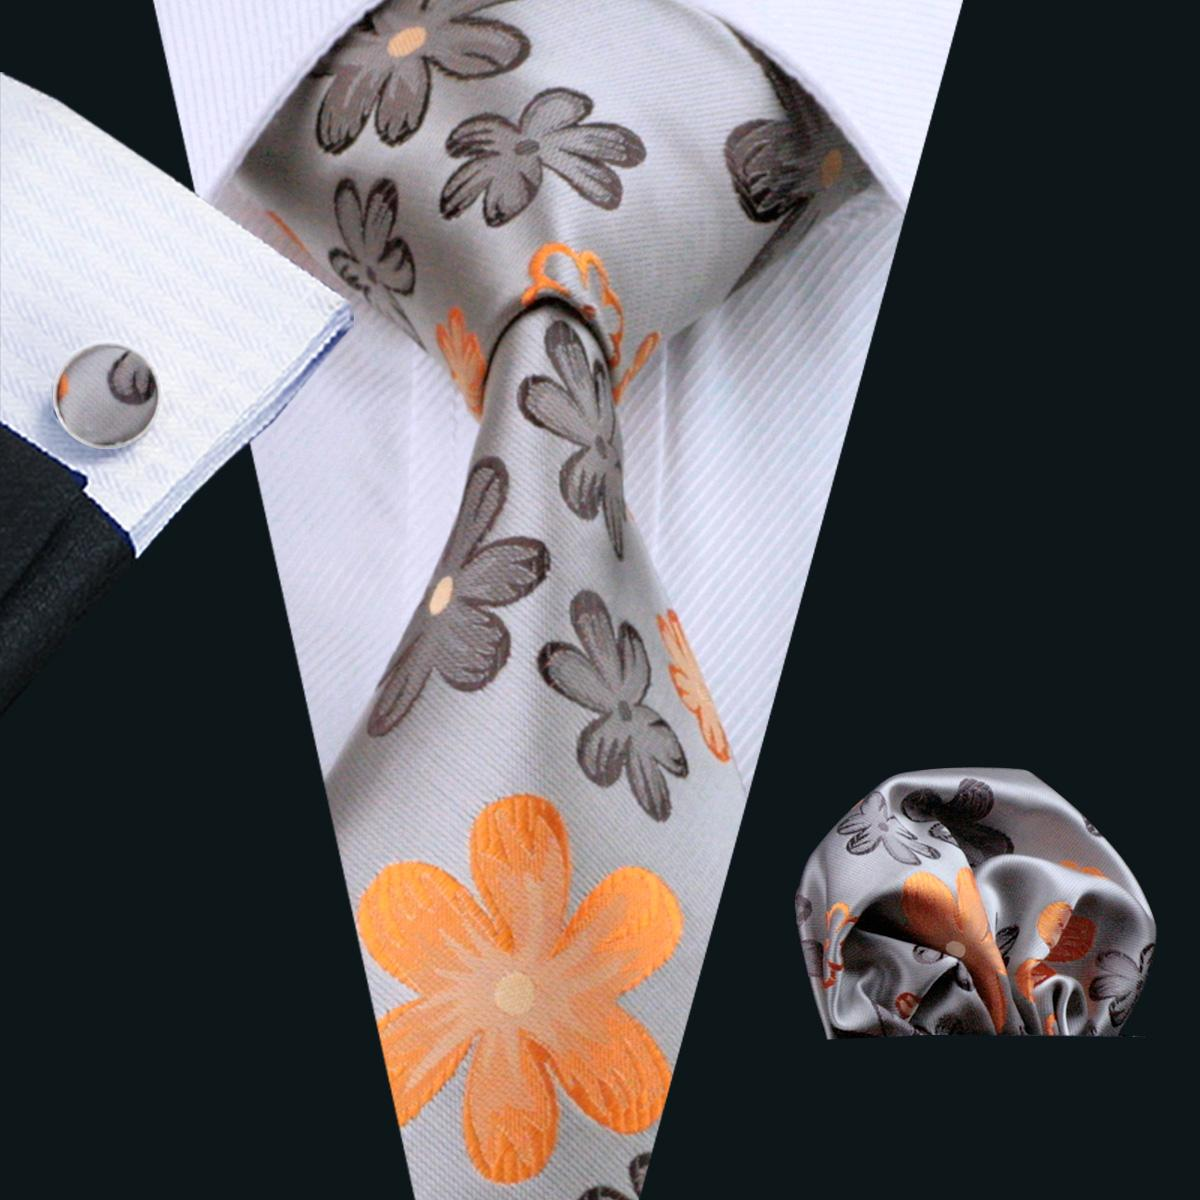 Geel Floral Silk Mens Tie Set Pocket Square Manchetknopen Klassieke Zijde Jacquard Geweven Bruiloft Business Casual Stropdas N-1016